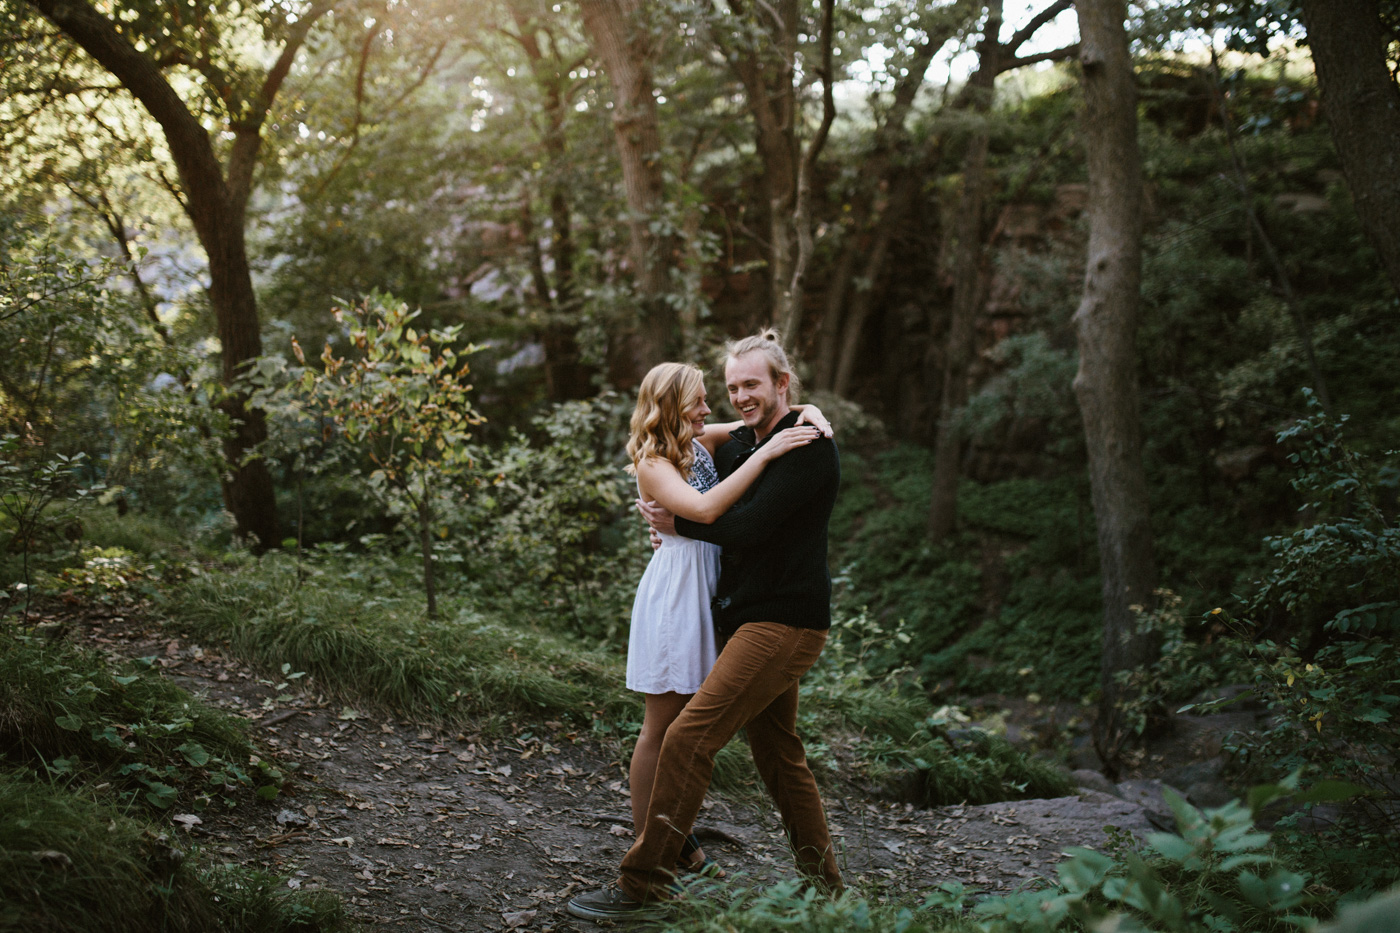 Sioux_Falls_Des_Moines_Engagement_Wedding_Photographer_03.jpg